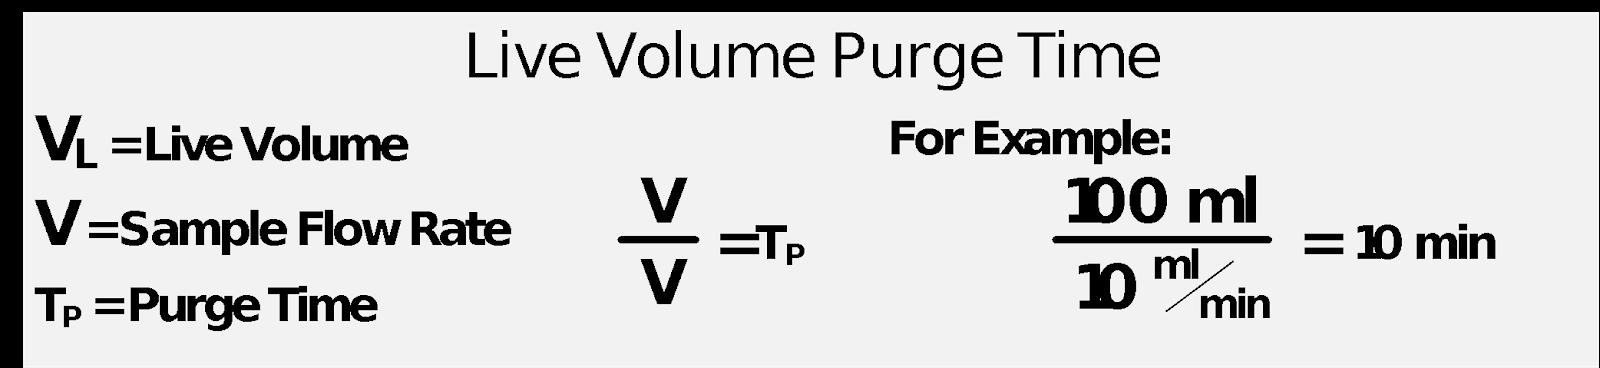 Live Volume Purge Time